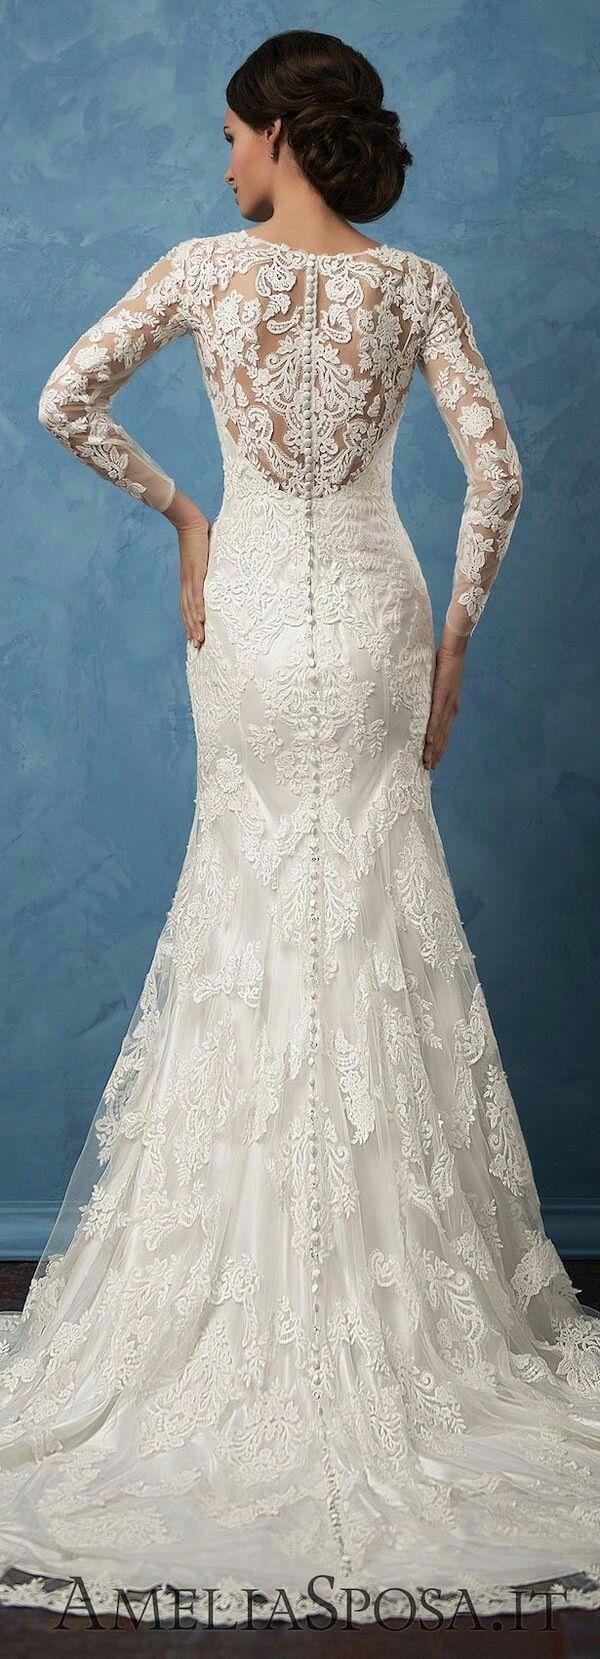 Nozze - Wedding Dress And Etc